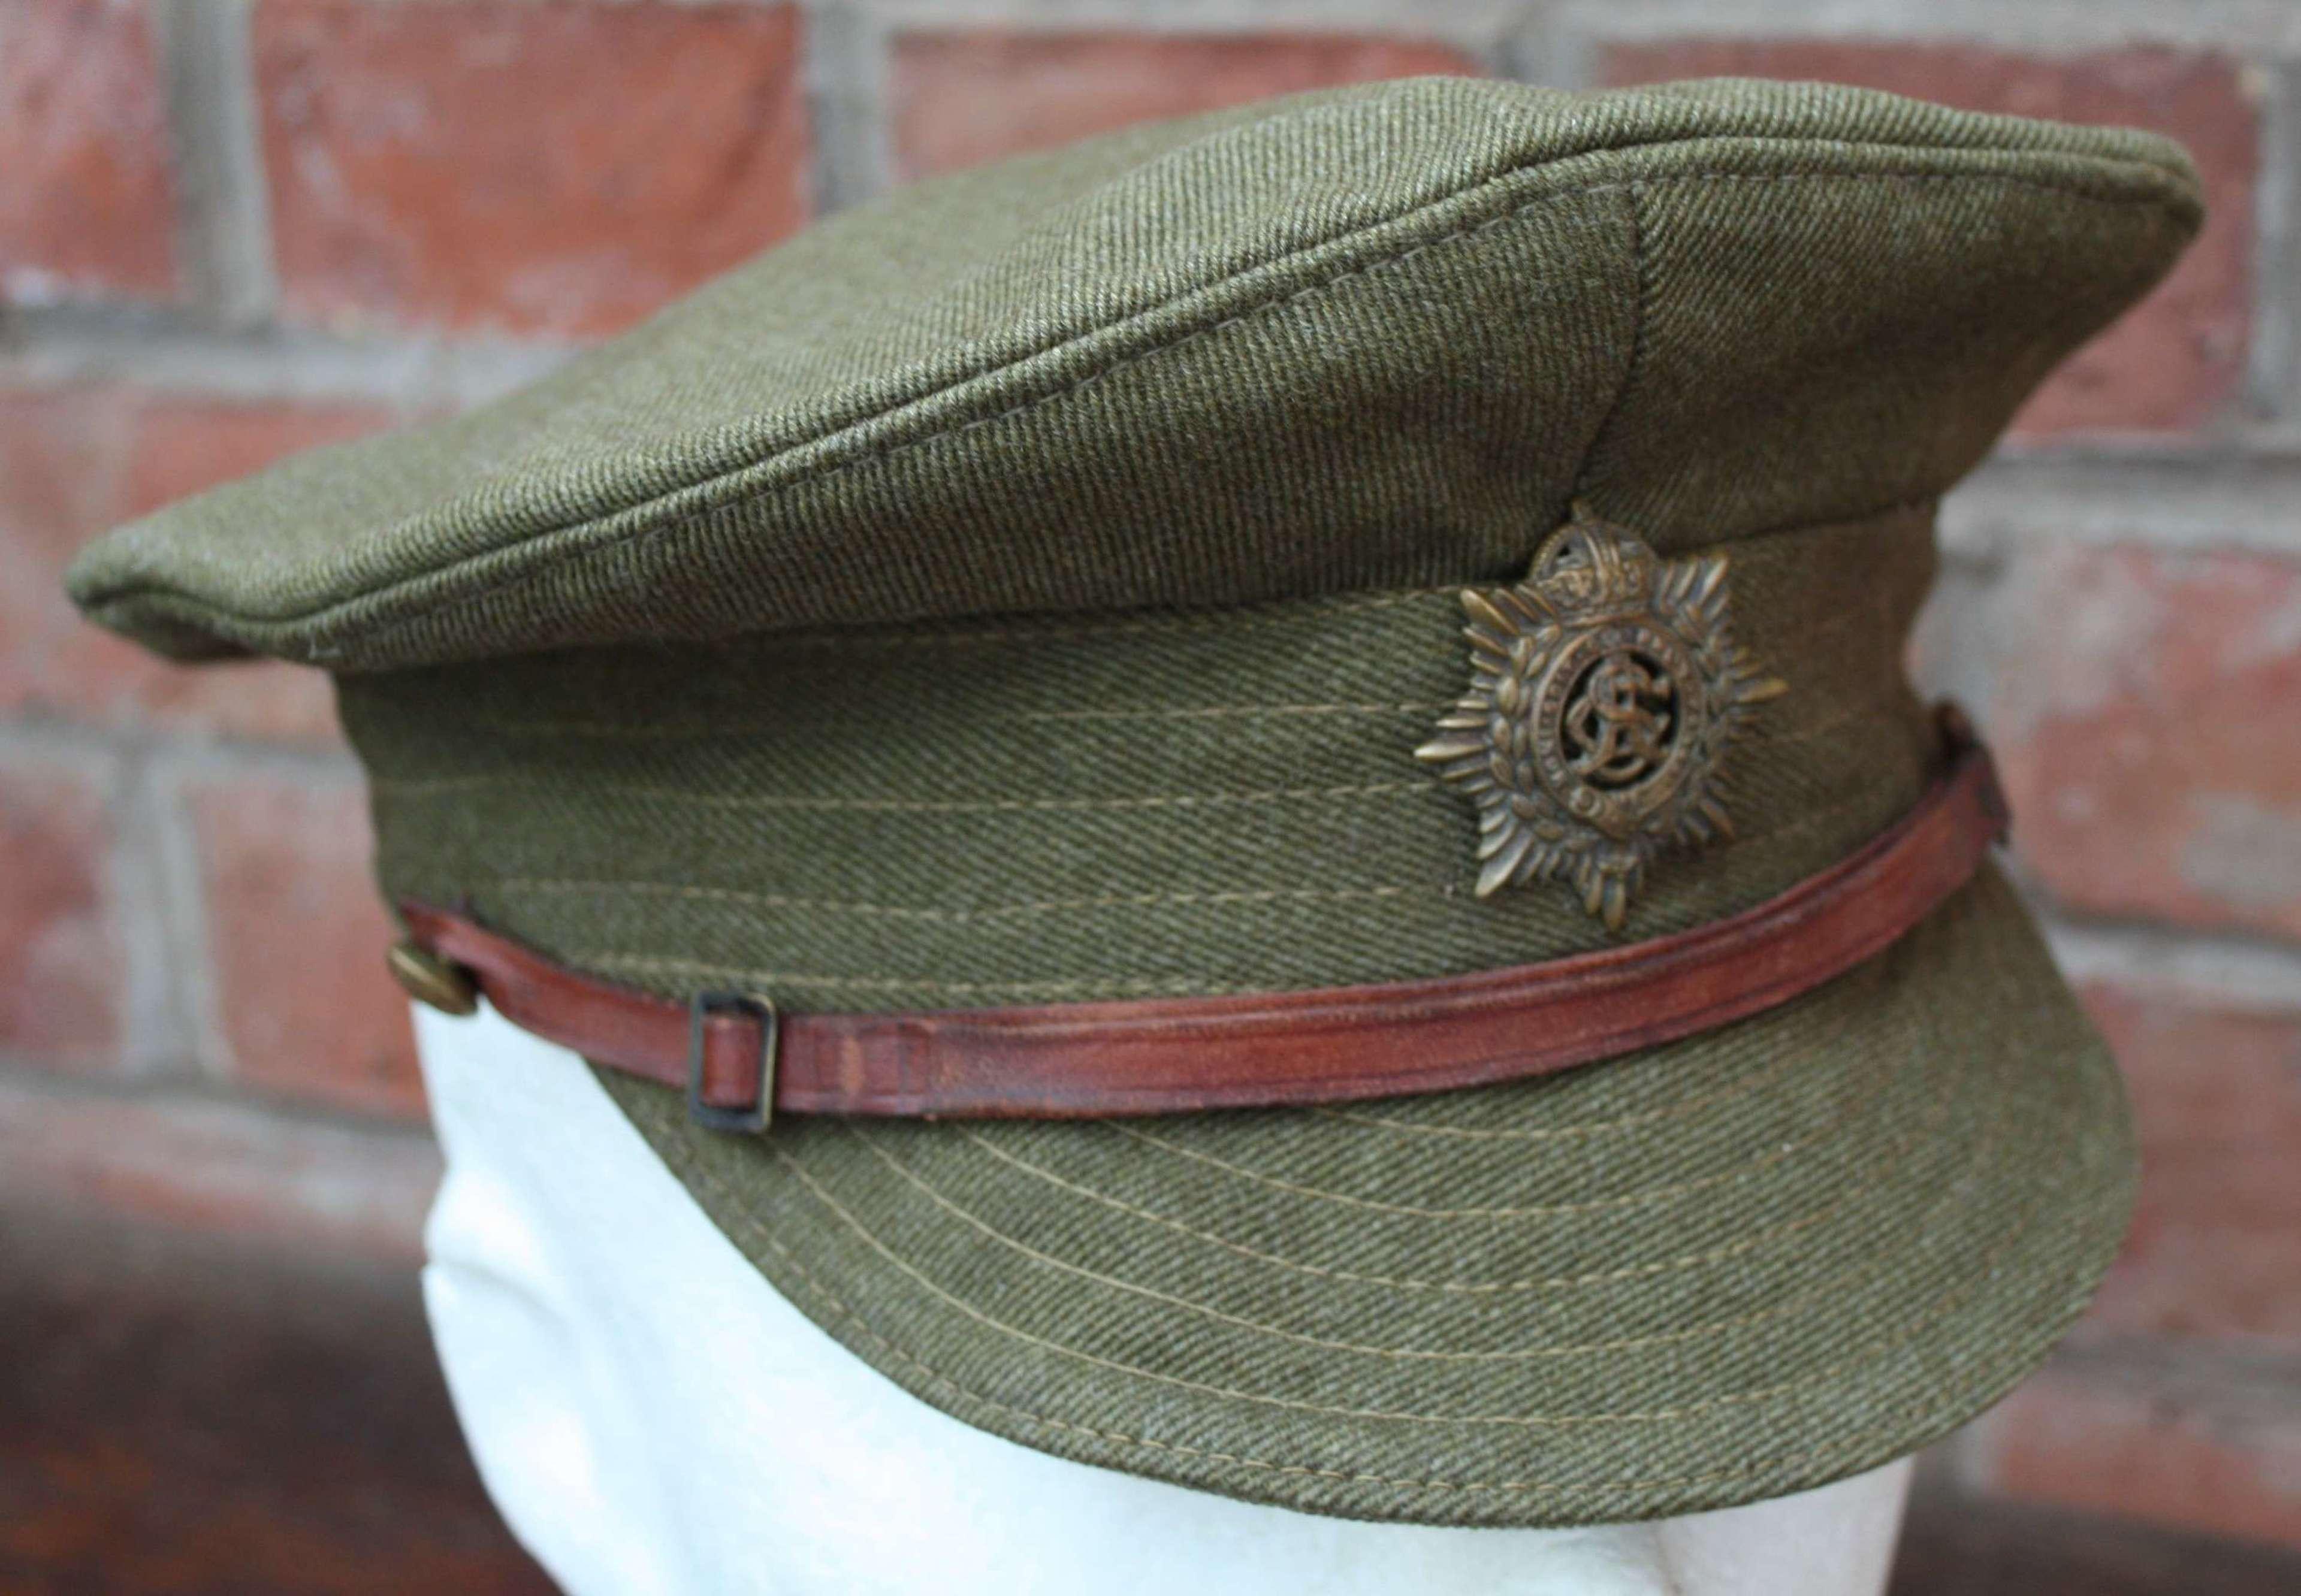 WW1 British Army 1918 Dated Khaki Trench Cap.